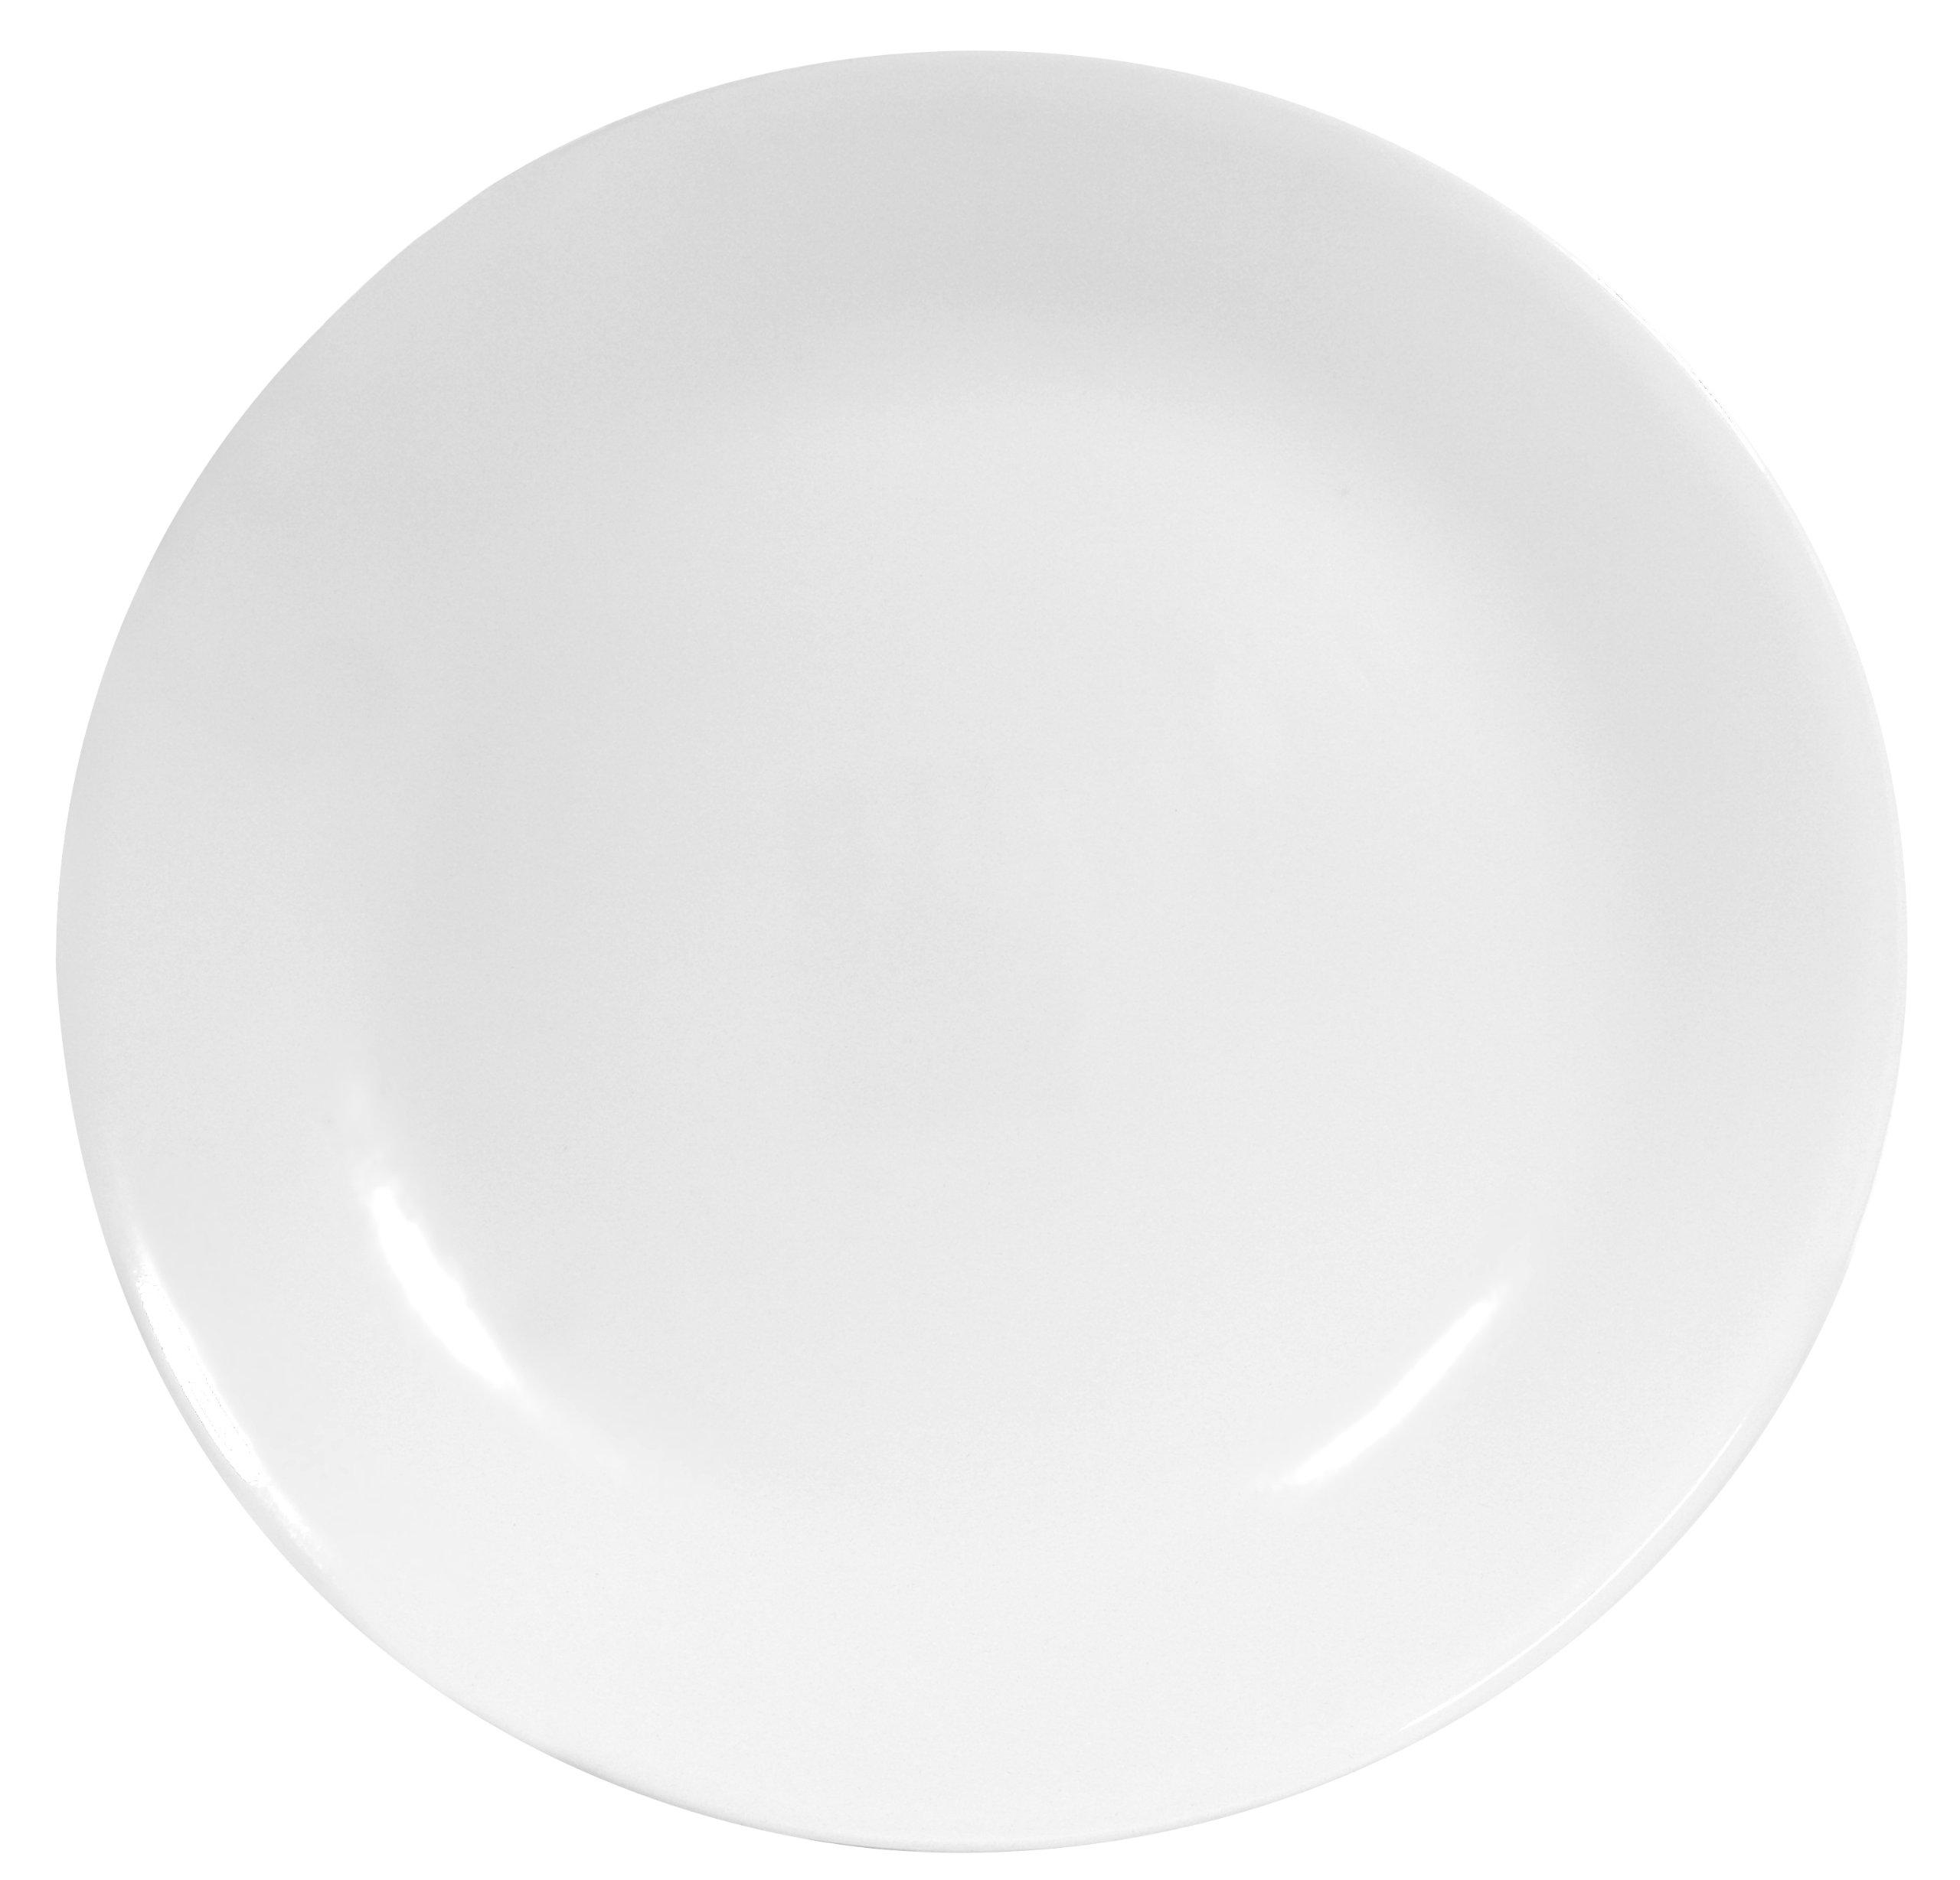 Corelle 1107731  Livingware 6-Piece Dinner Plate Set, Winter Frost White by Corelle